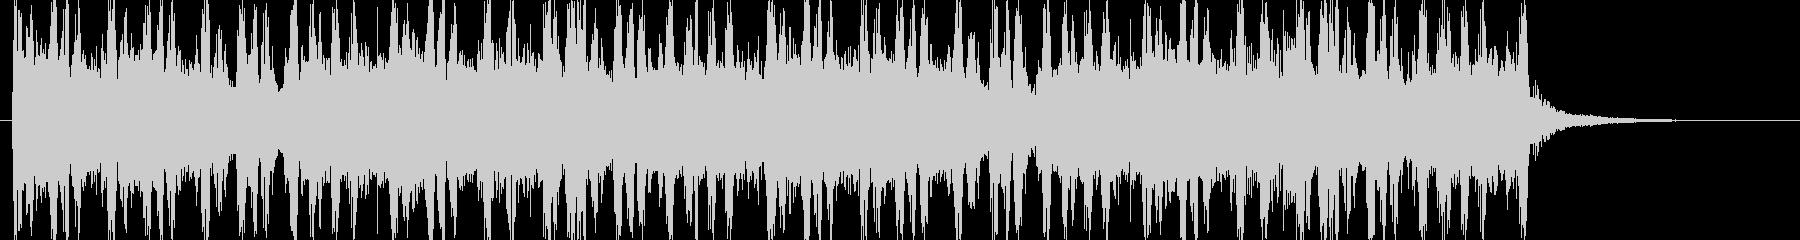 OP ED ノリノリなドラムパターンの未再生の波形